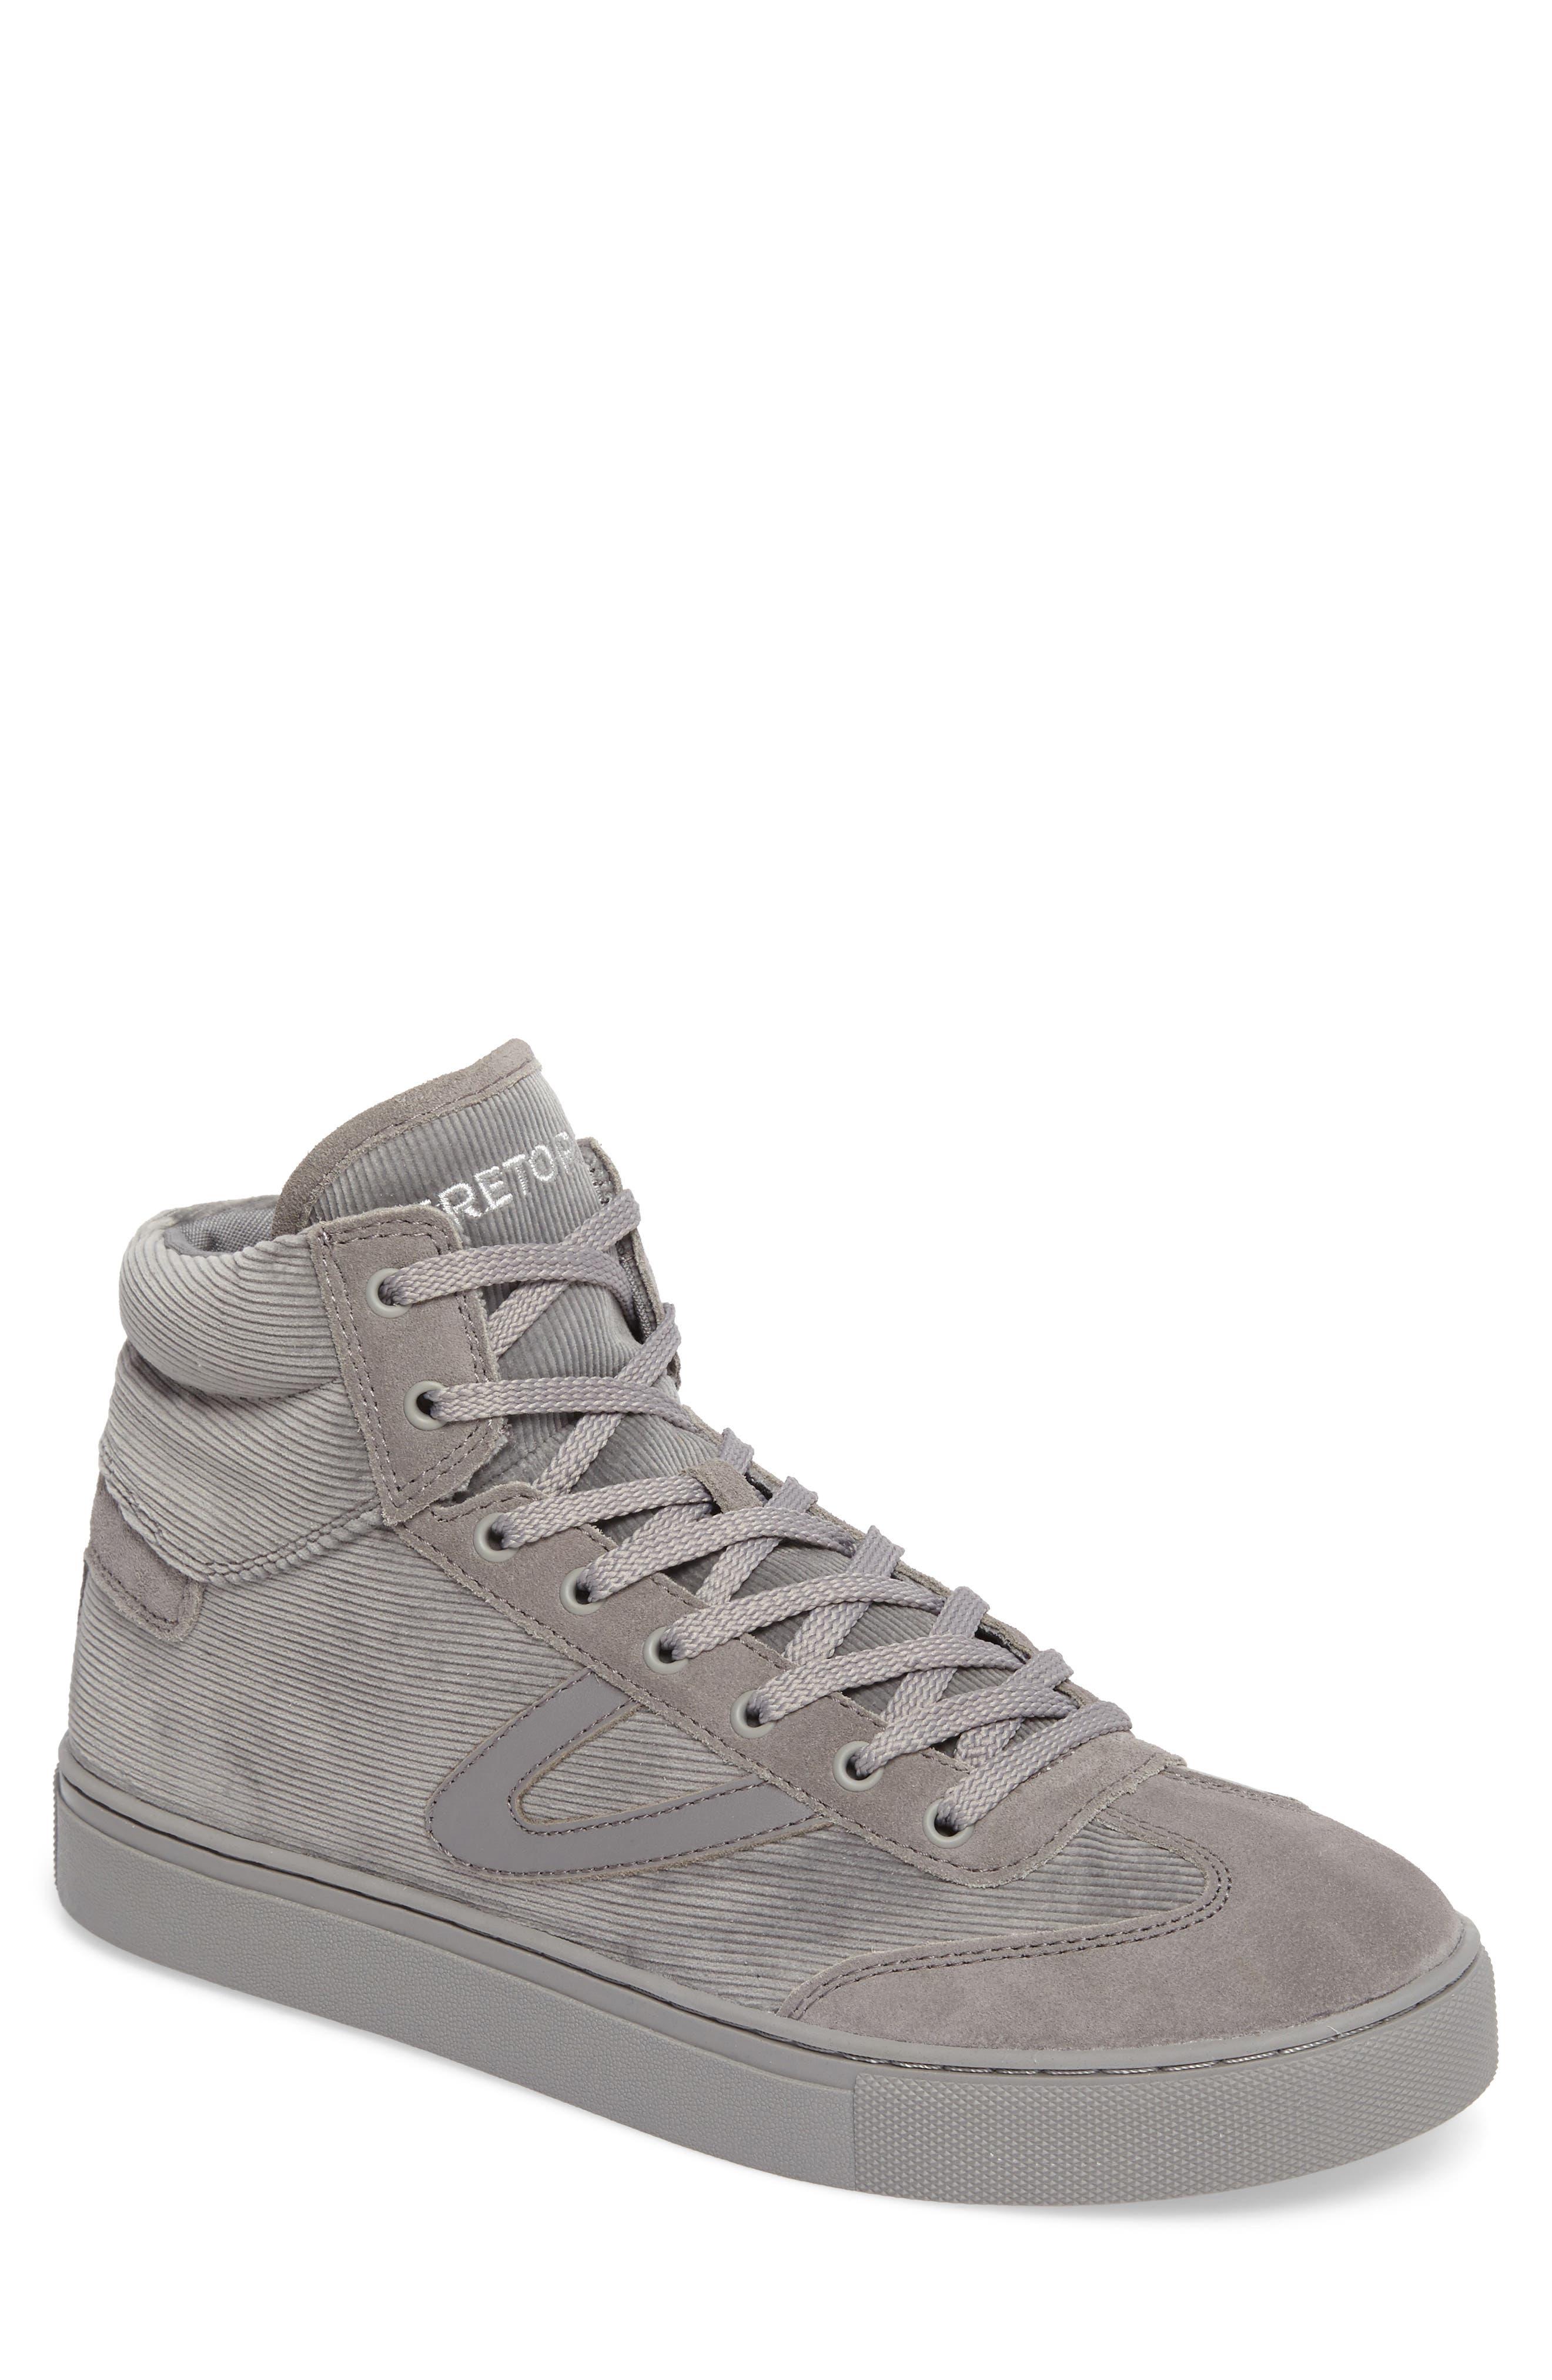 Jack High Top Sneaker,                         Main,                         color,